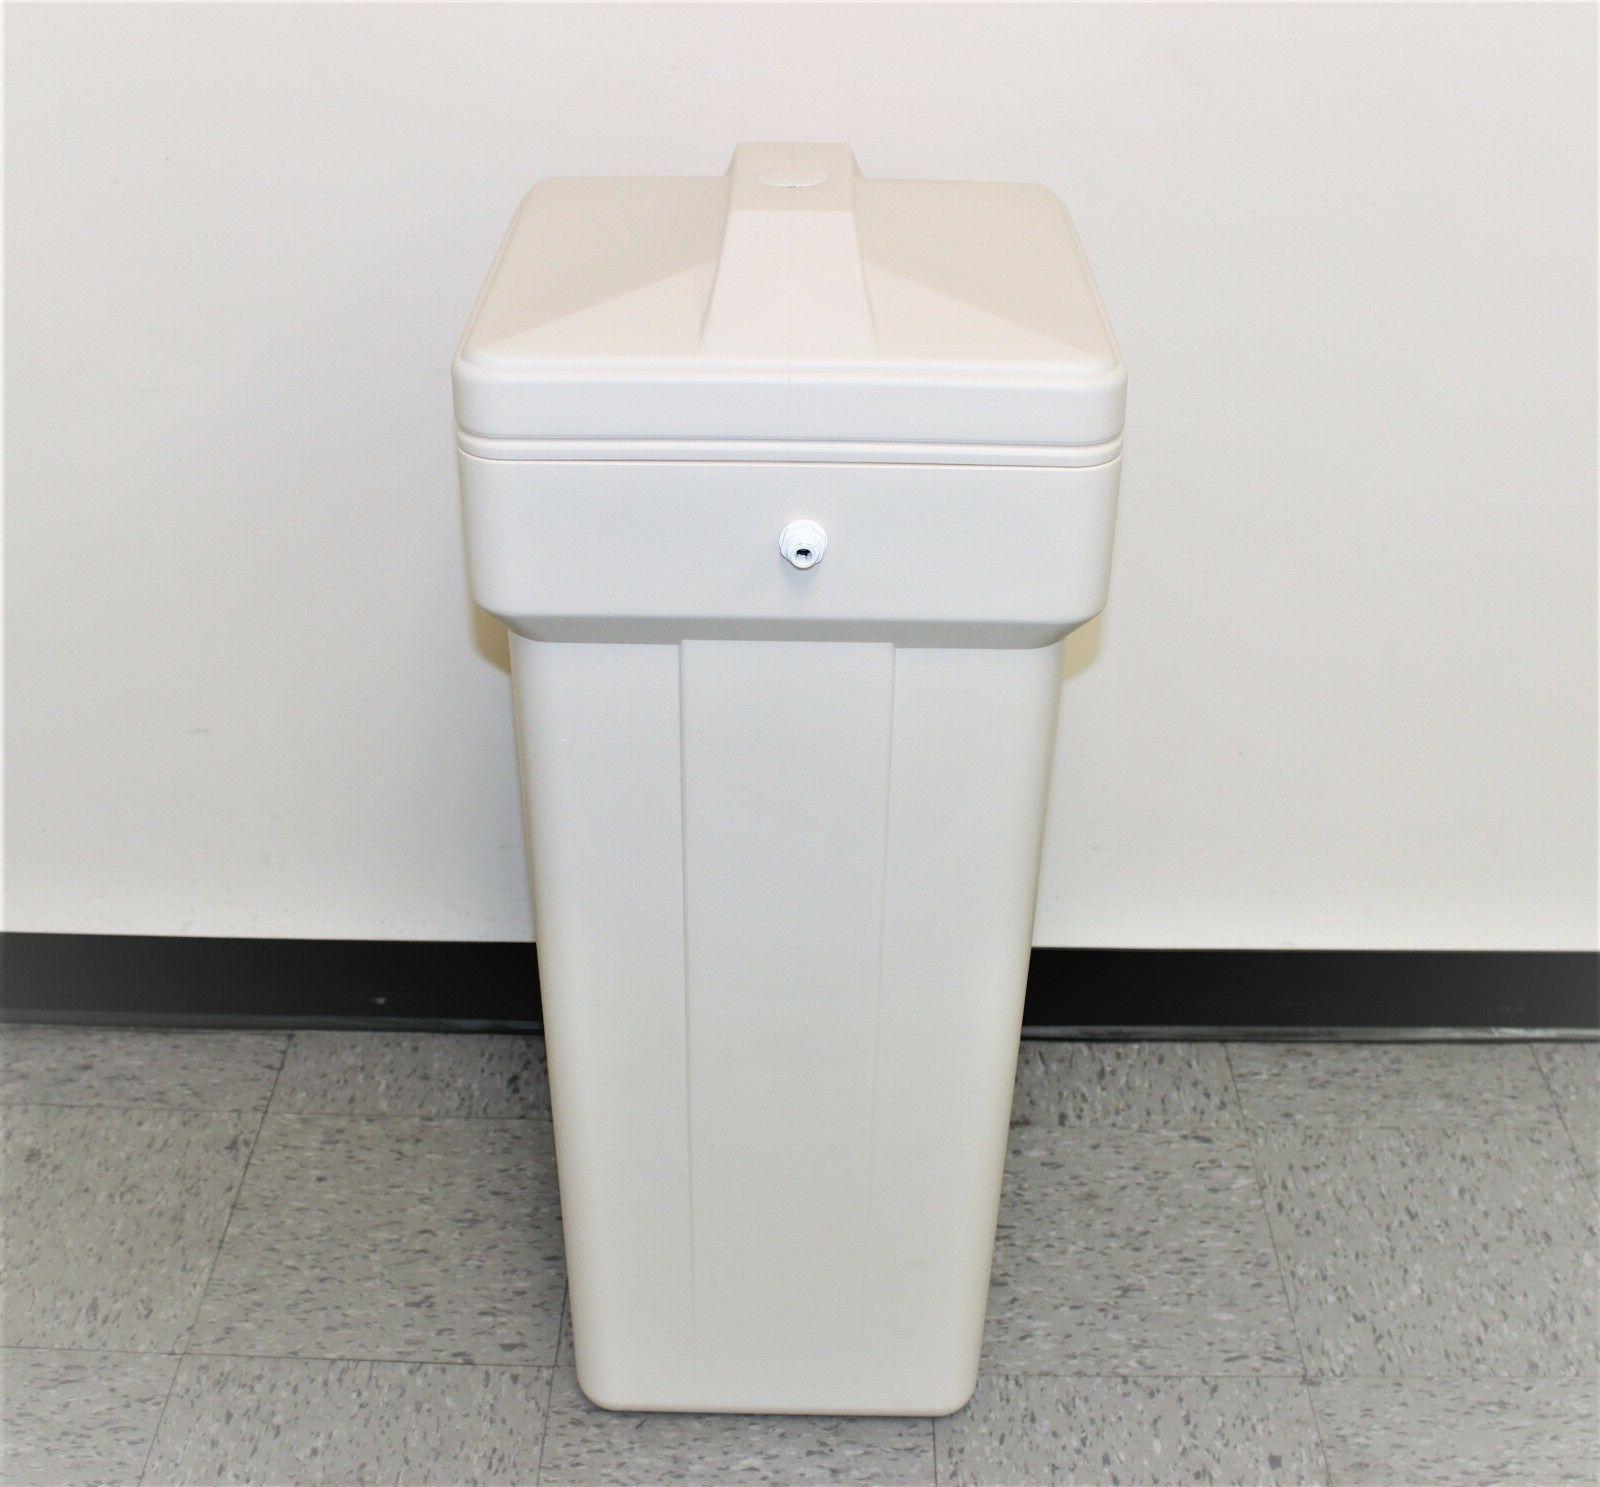 Water Softener Filter 32,000 1 Cu Ft. Tank